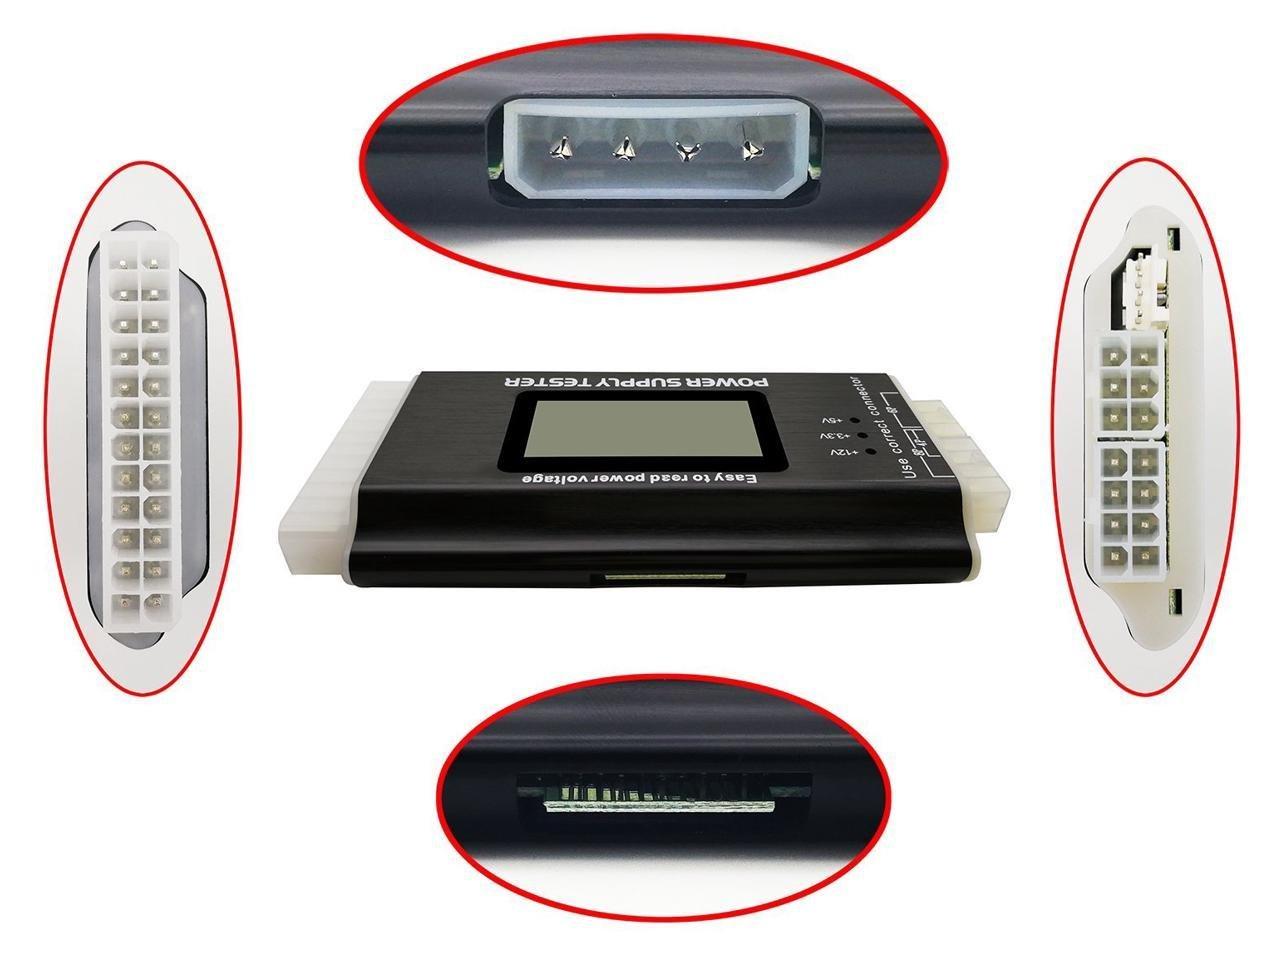 Tekit Computer PC Power Supply Tester, ATX / ITX / IDE / HDD / SATA / BYI Connectors Power Supply Tester, 1.8'' (Aluminum Alloy Enclosure) 20/24 pin 4 SATA HDD Testers by tekit (Image #3)